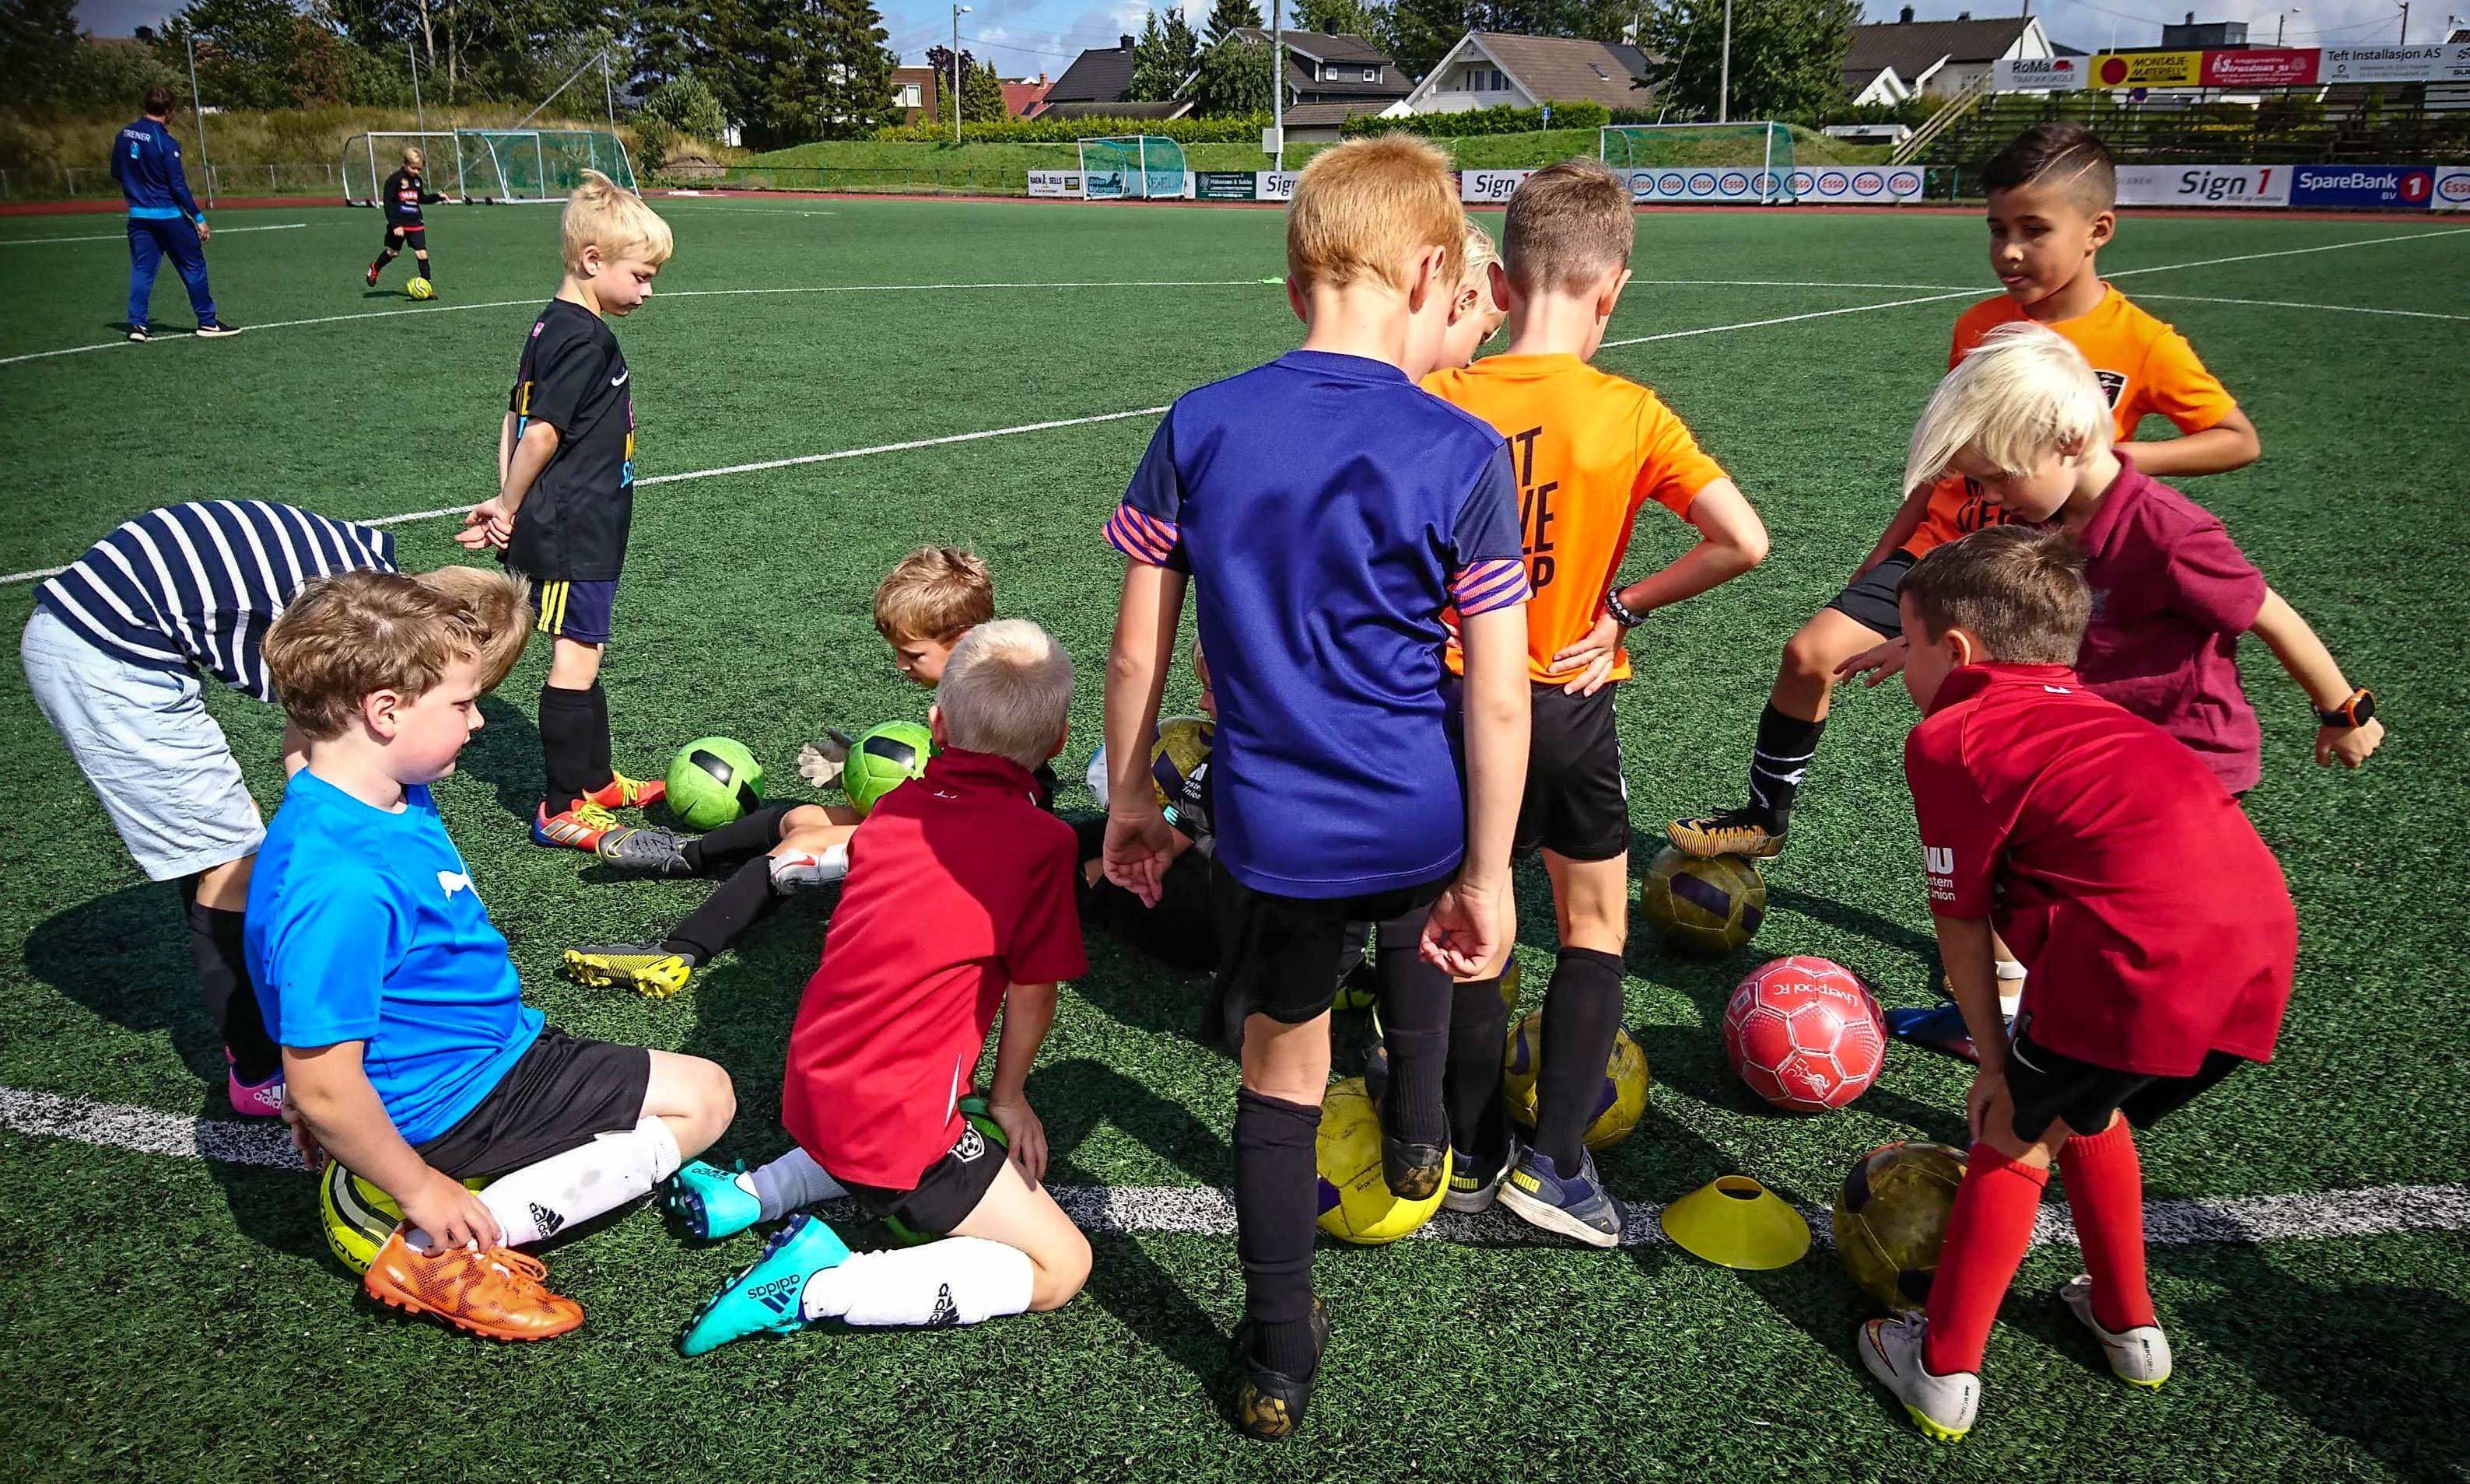 https://www.flintfotball.no/wp-content/uploads/2019/08/FFO-trening.jpg